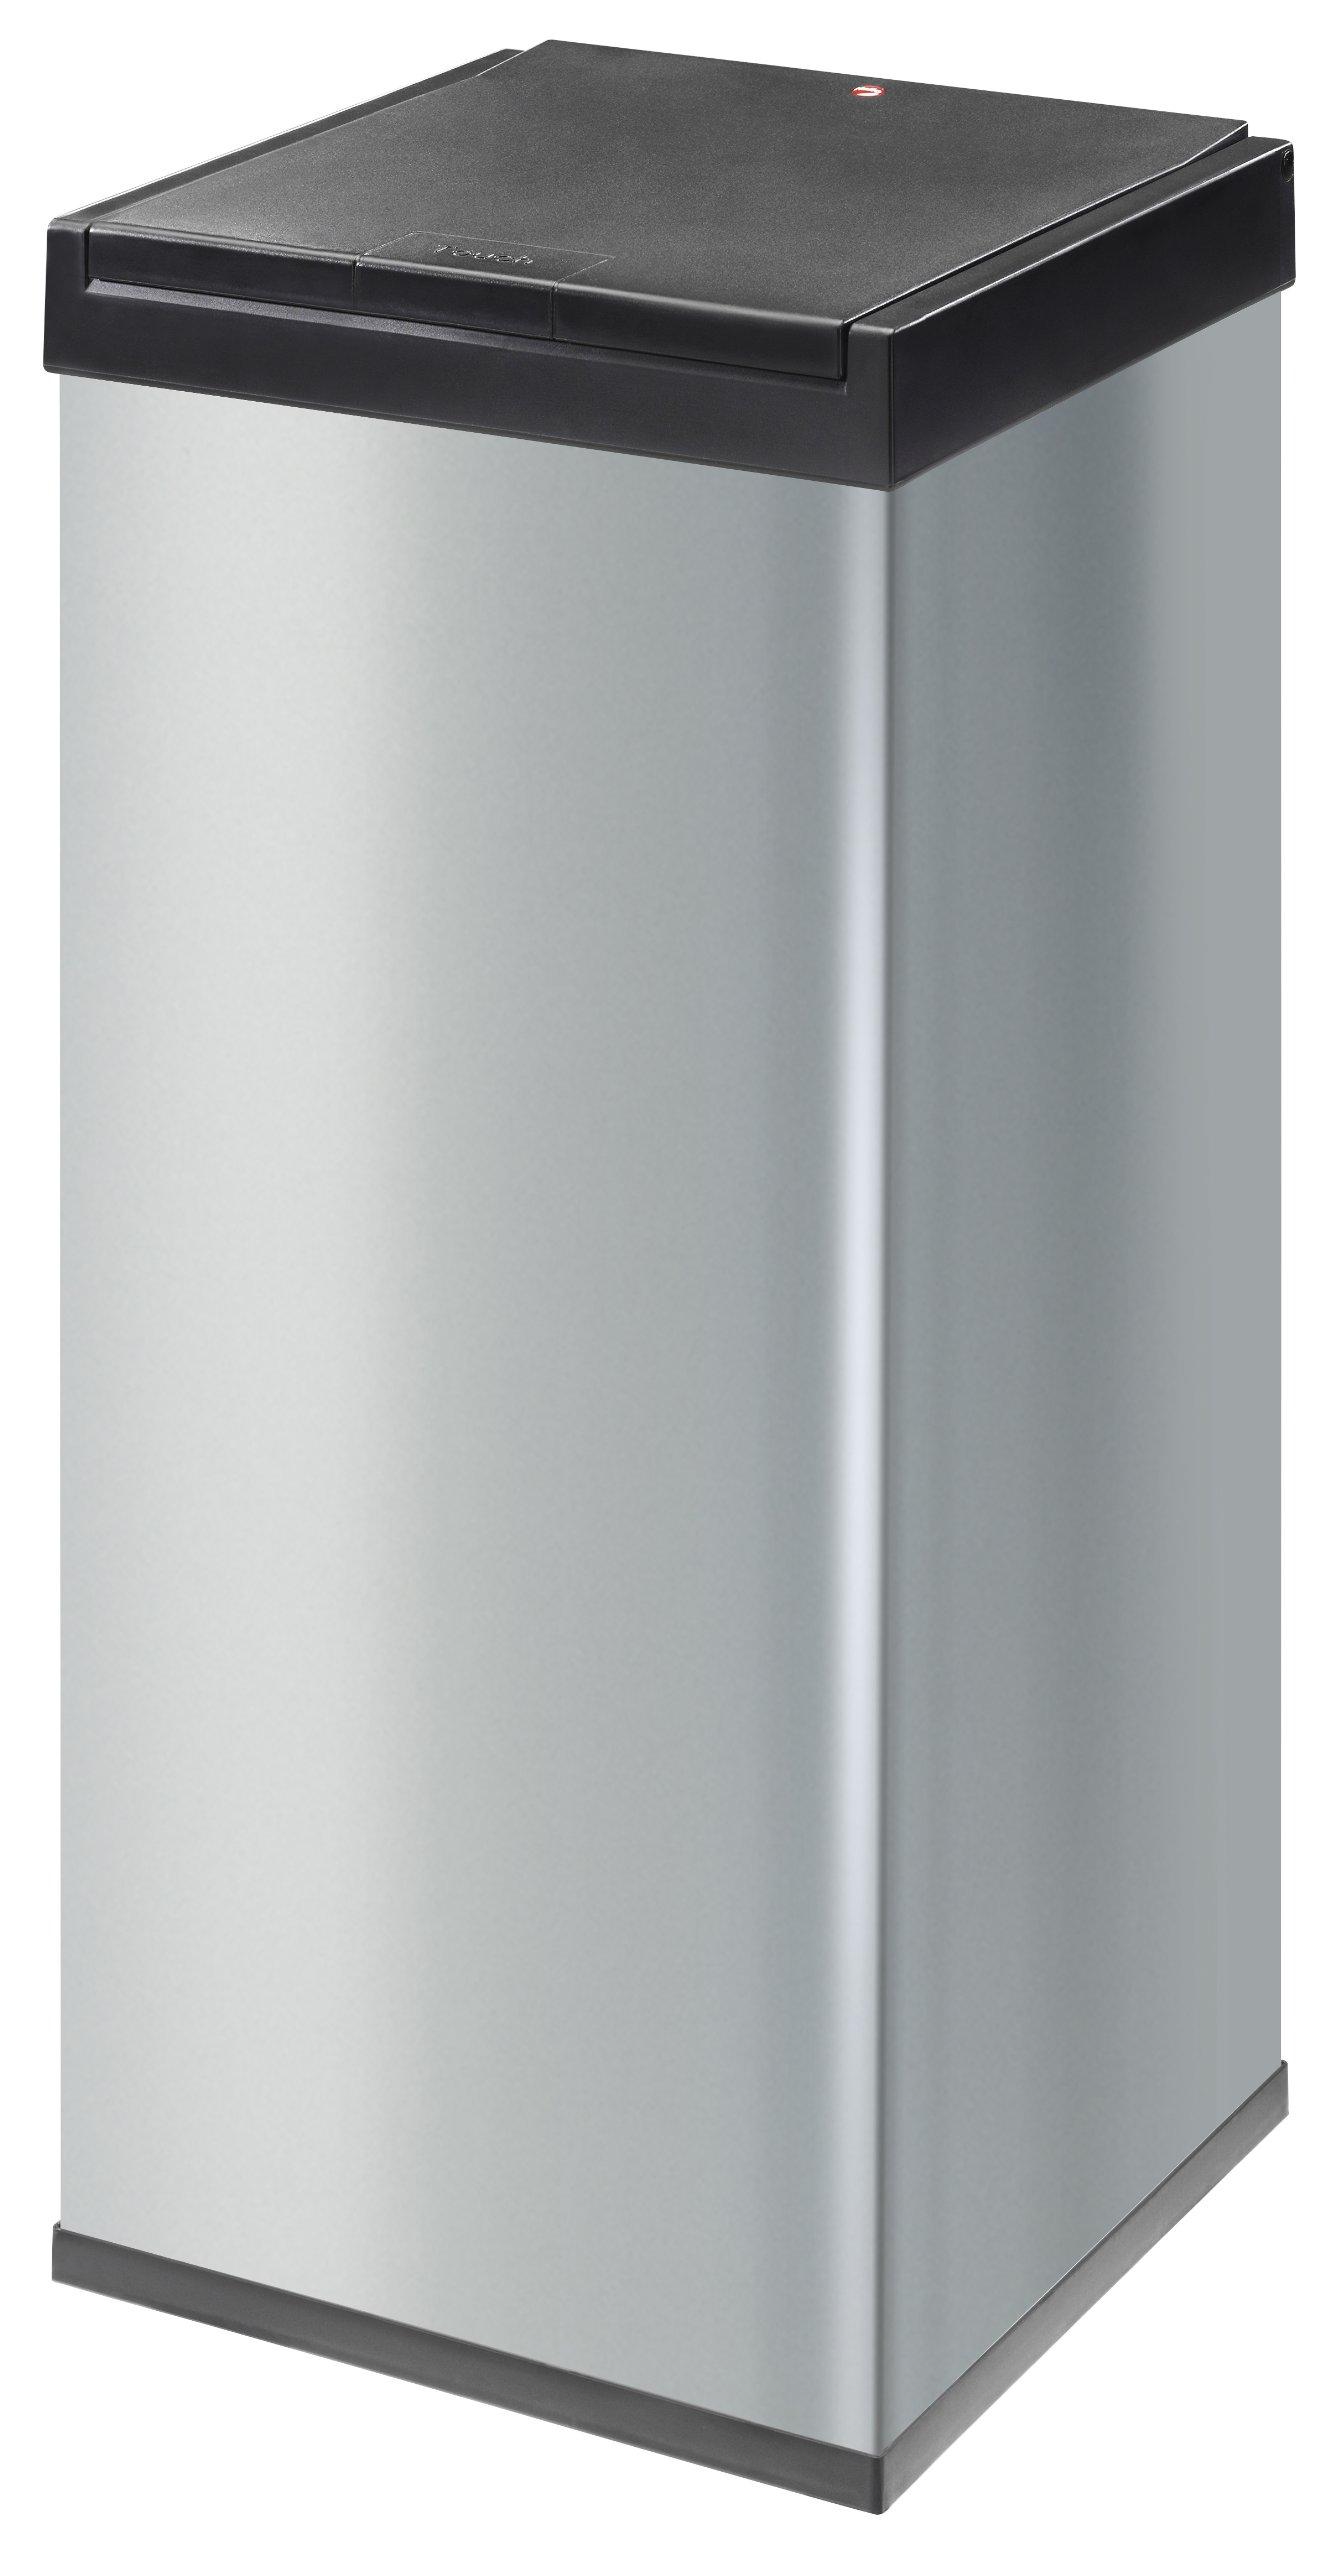 Hailo Big Box 80 Touch Waste Bins, Silver